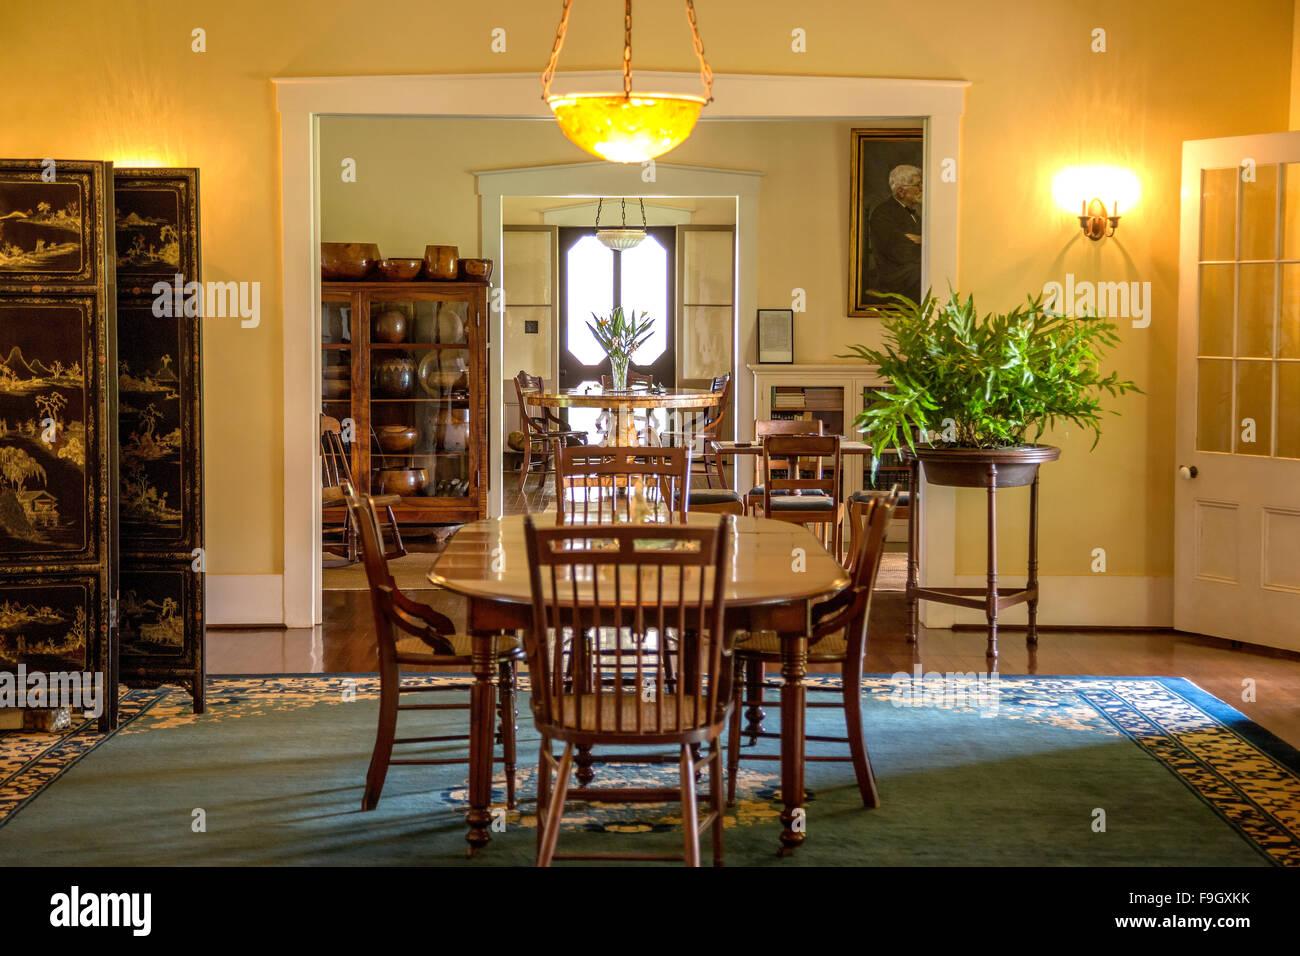 Dining room inside George Wilcox's home in Lihue, Kauai - Stock Image